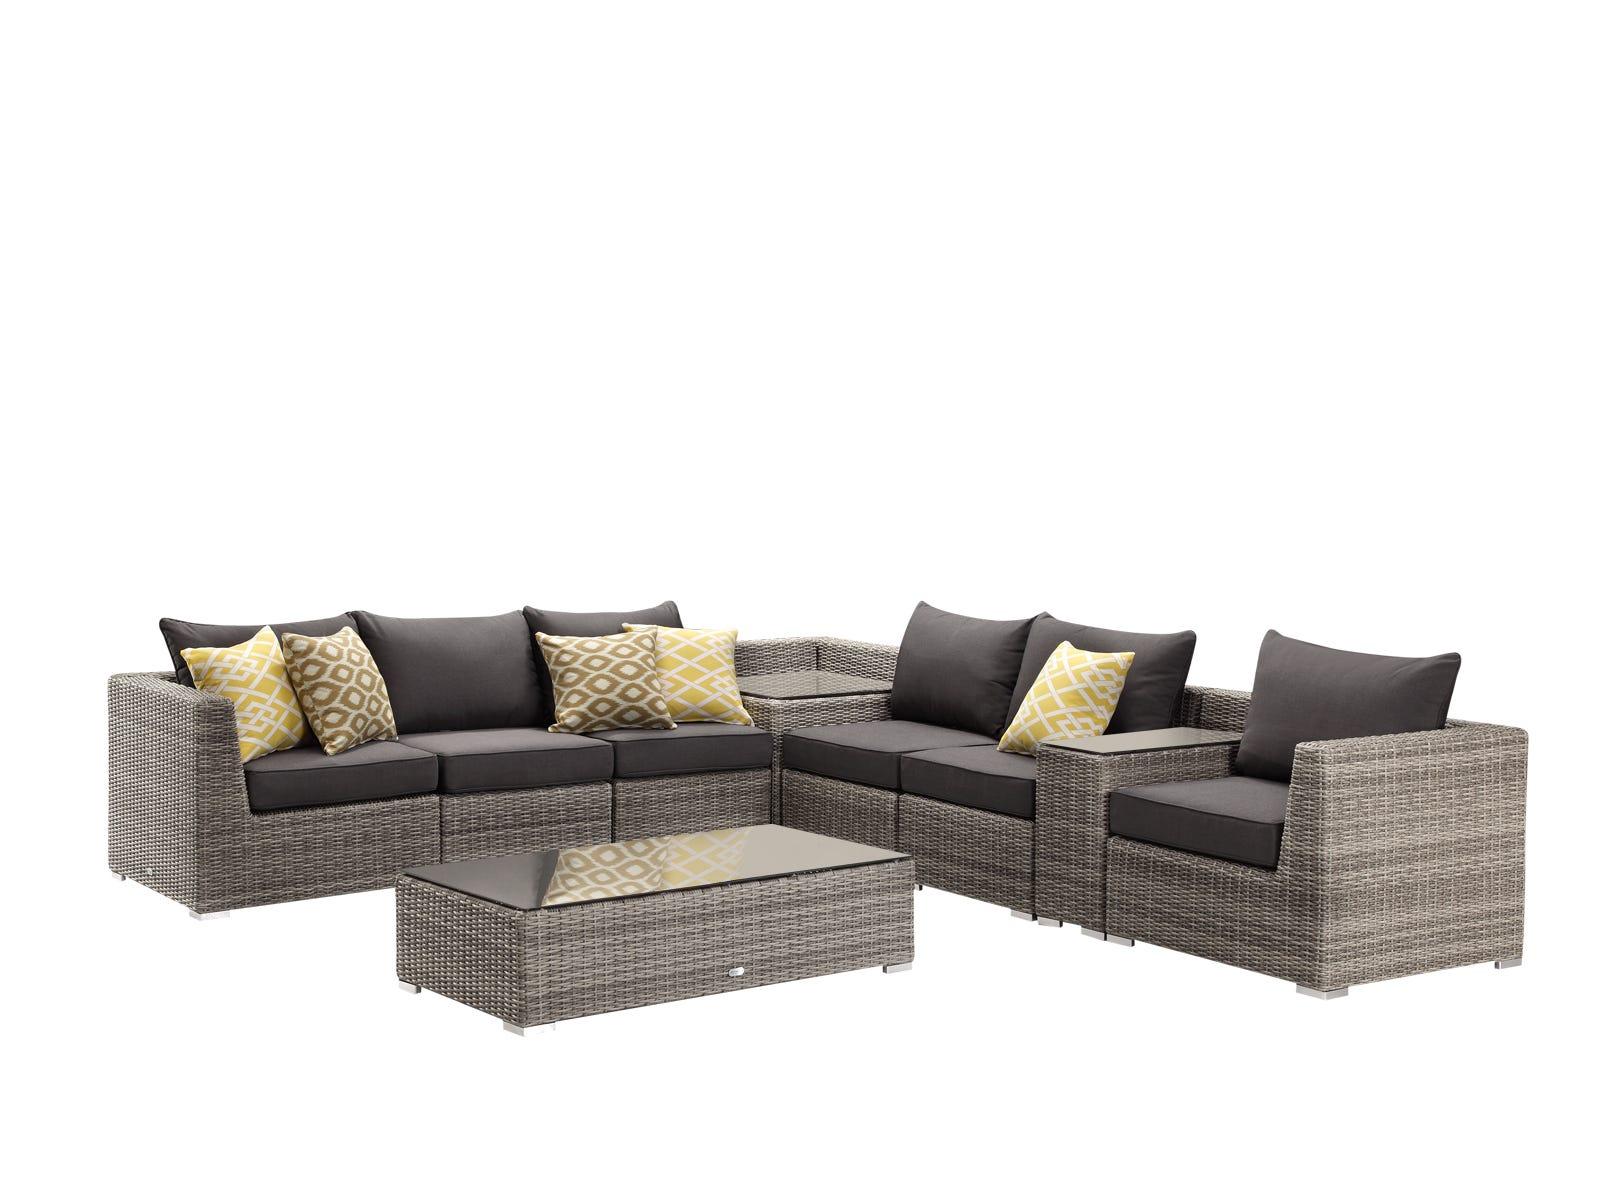 Outdoor furniture lounge wicker sunbrella mateus 9pc moonscape